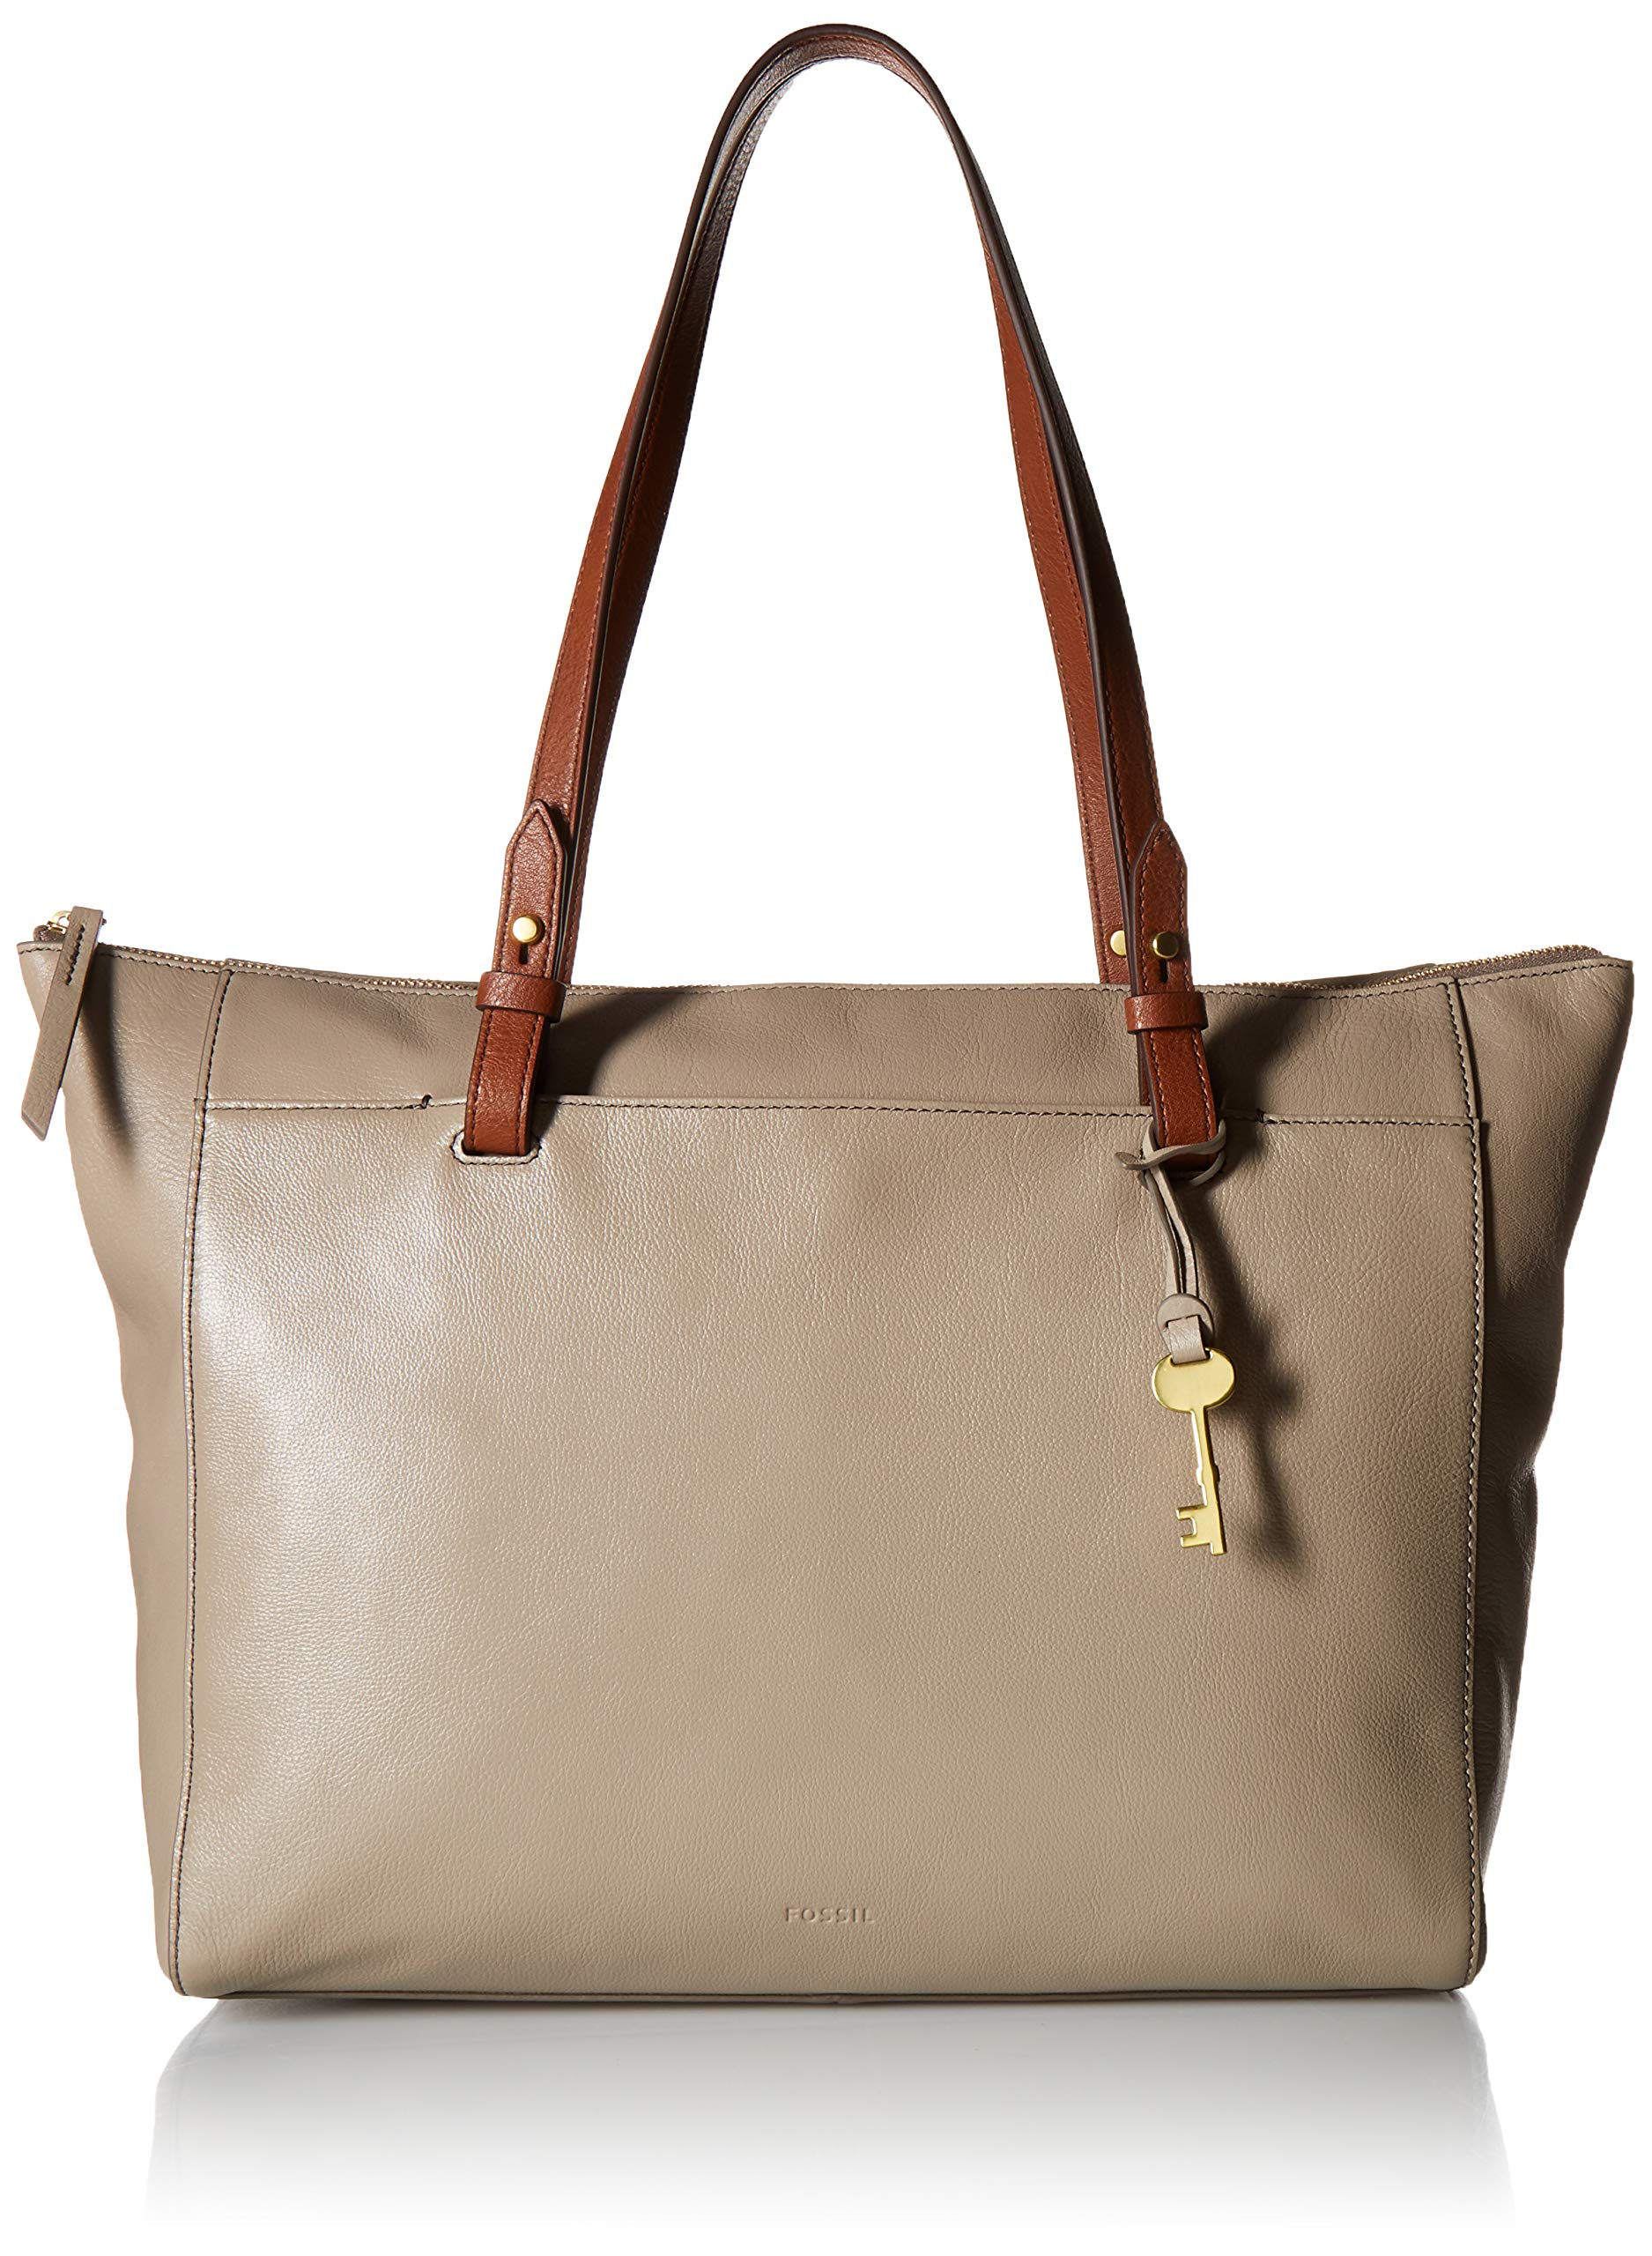 Fossil-Rachel-Tote-Bag